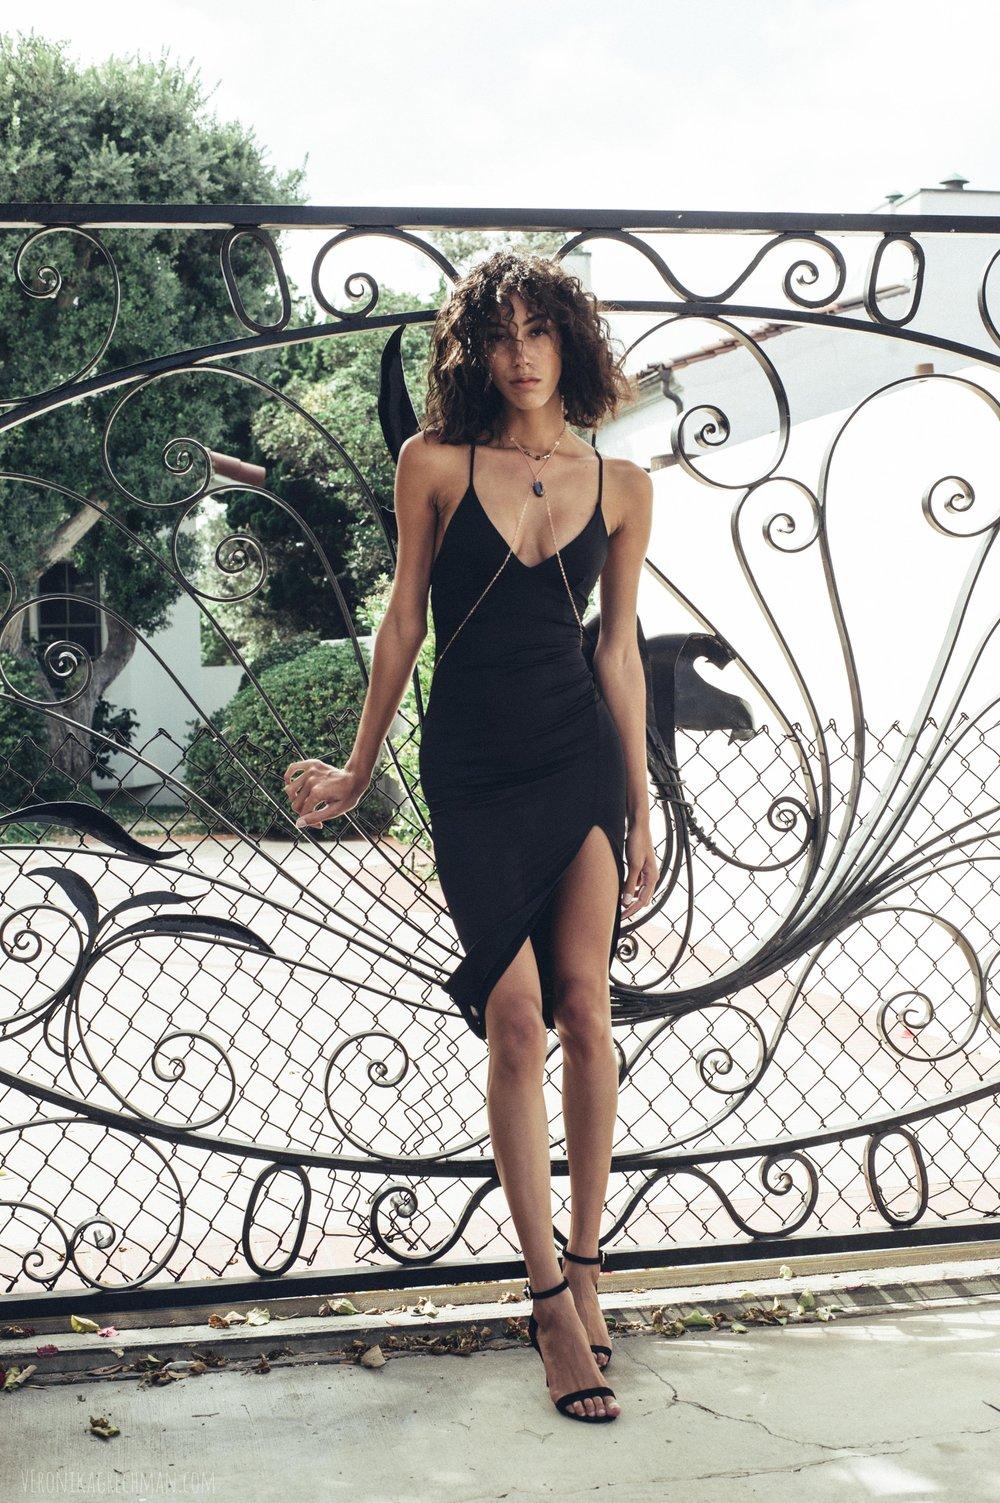 Jewellery fashion photoshoot inspiration